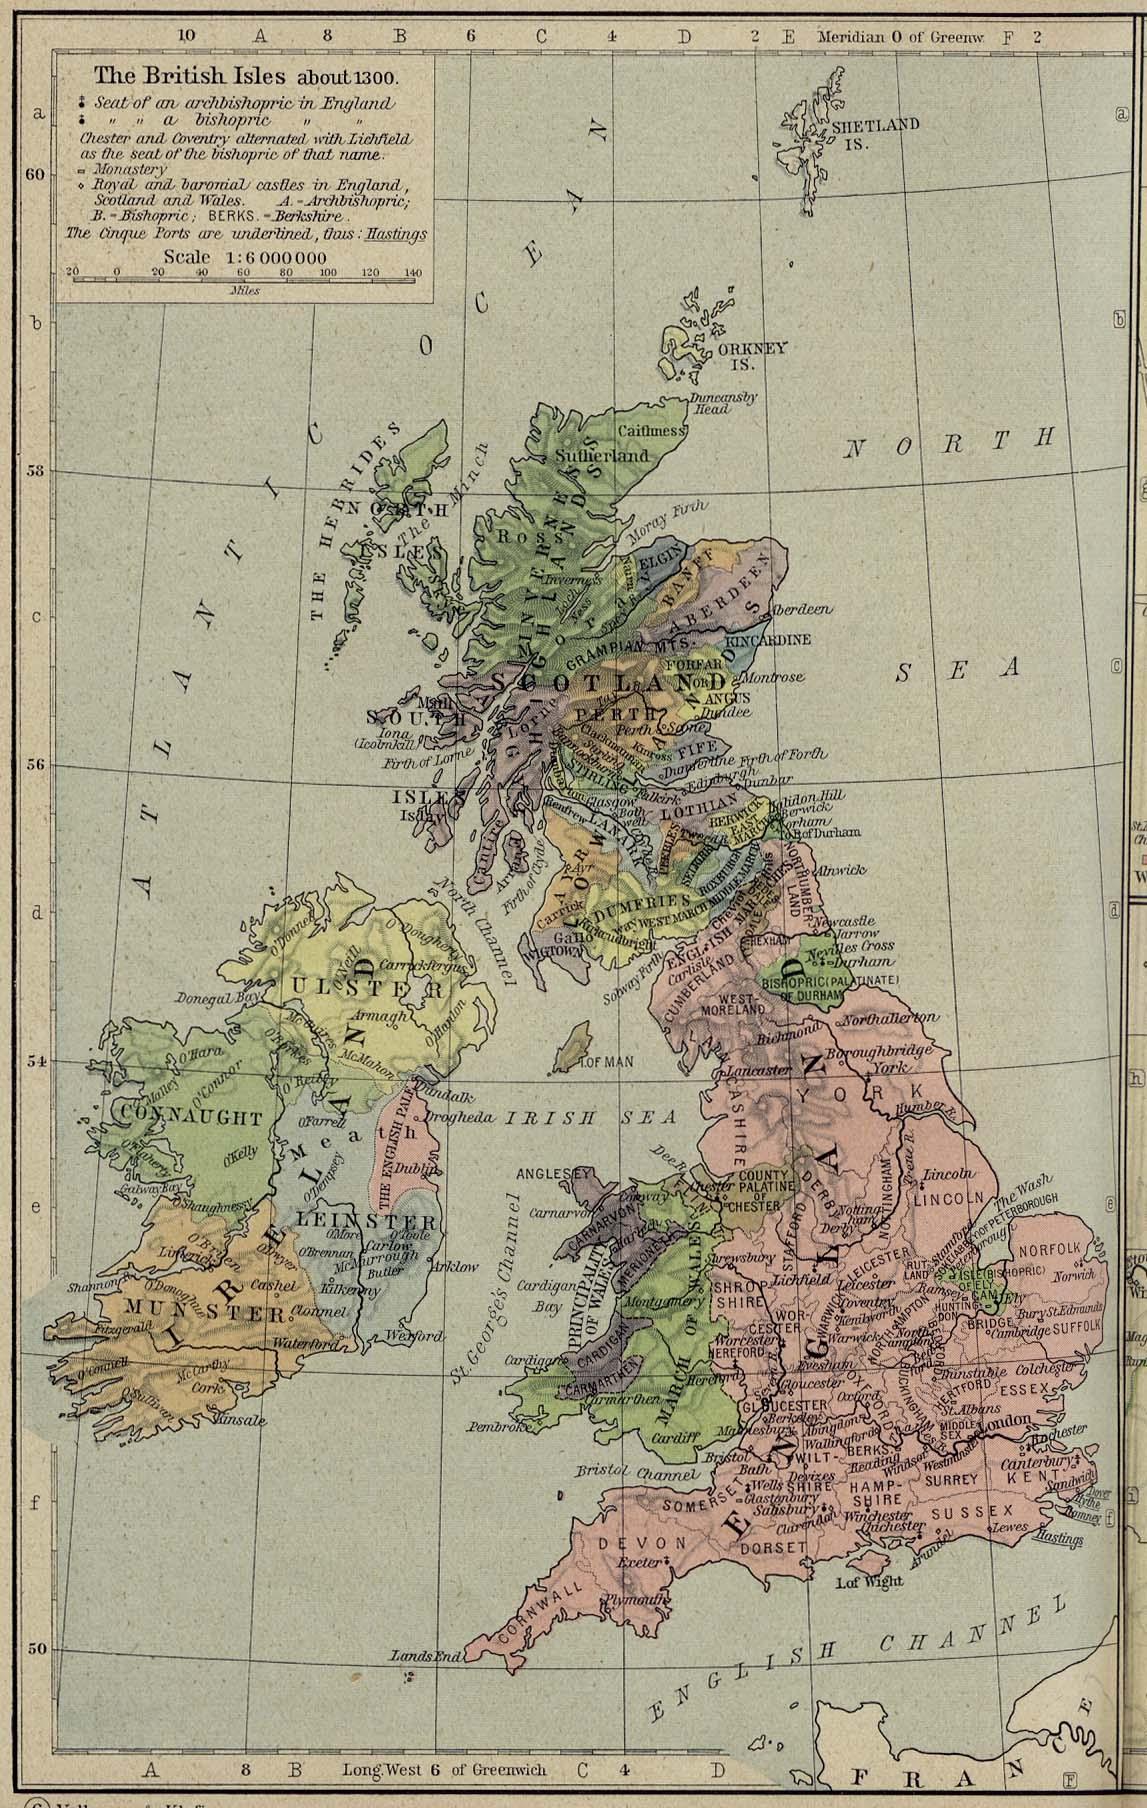 British Isles Map 1300 Full size